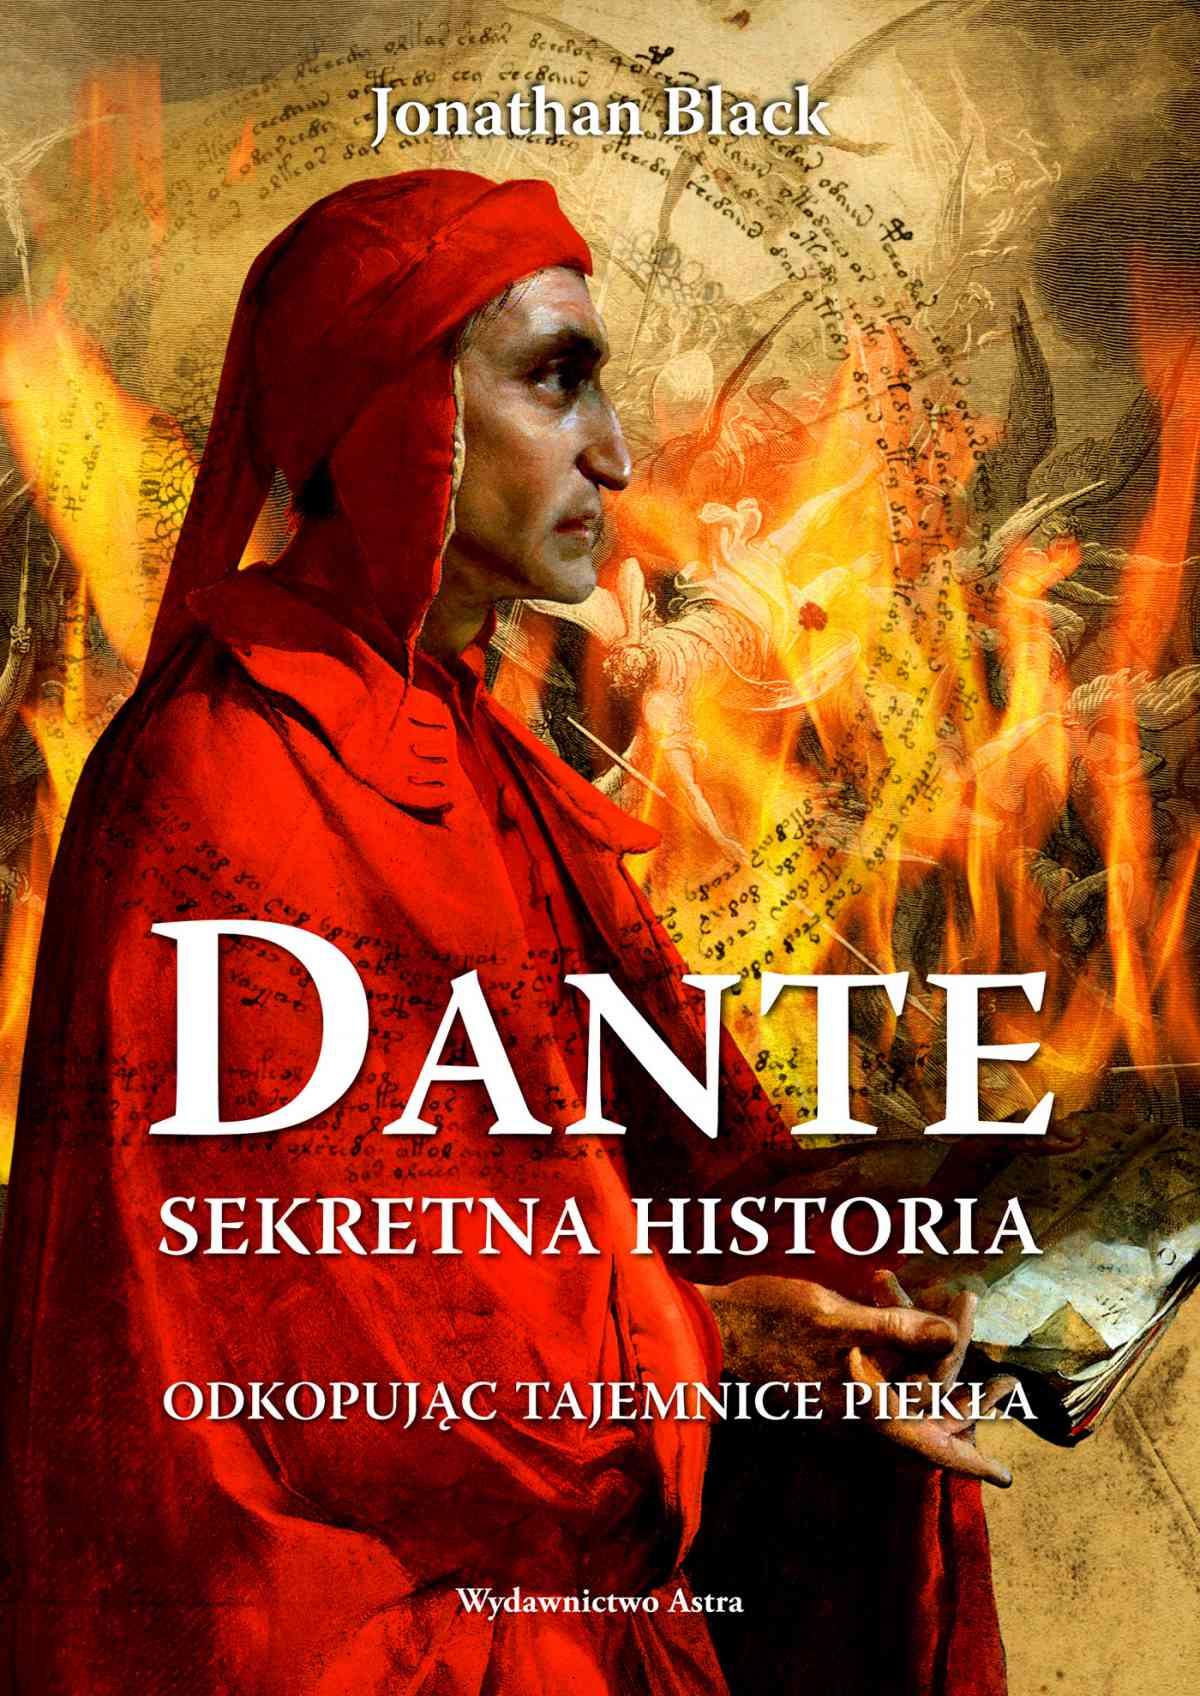 Dante. Sekretna historia - Ebook (Książka EPUB) do pobrania w formacie EPUB